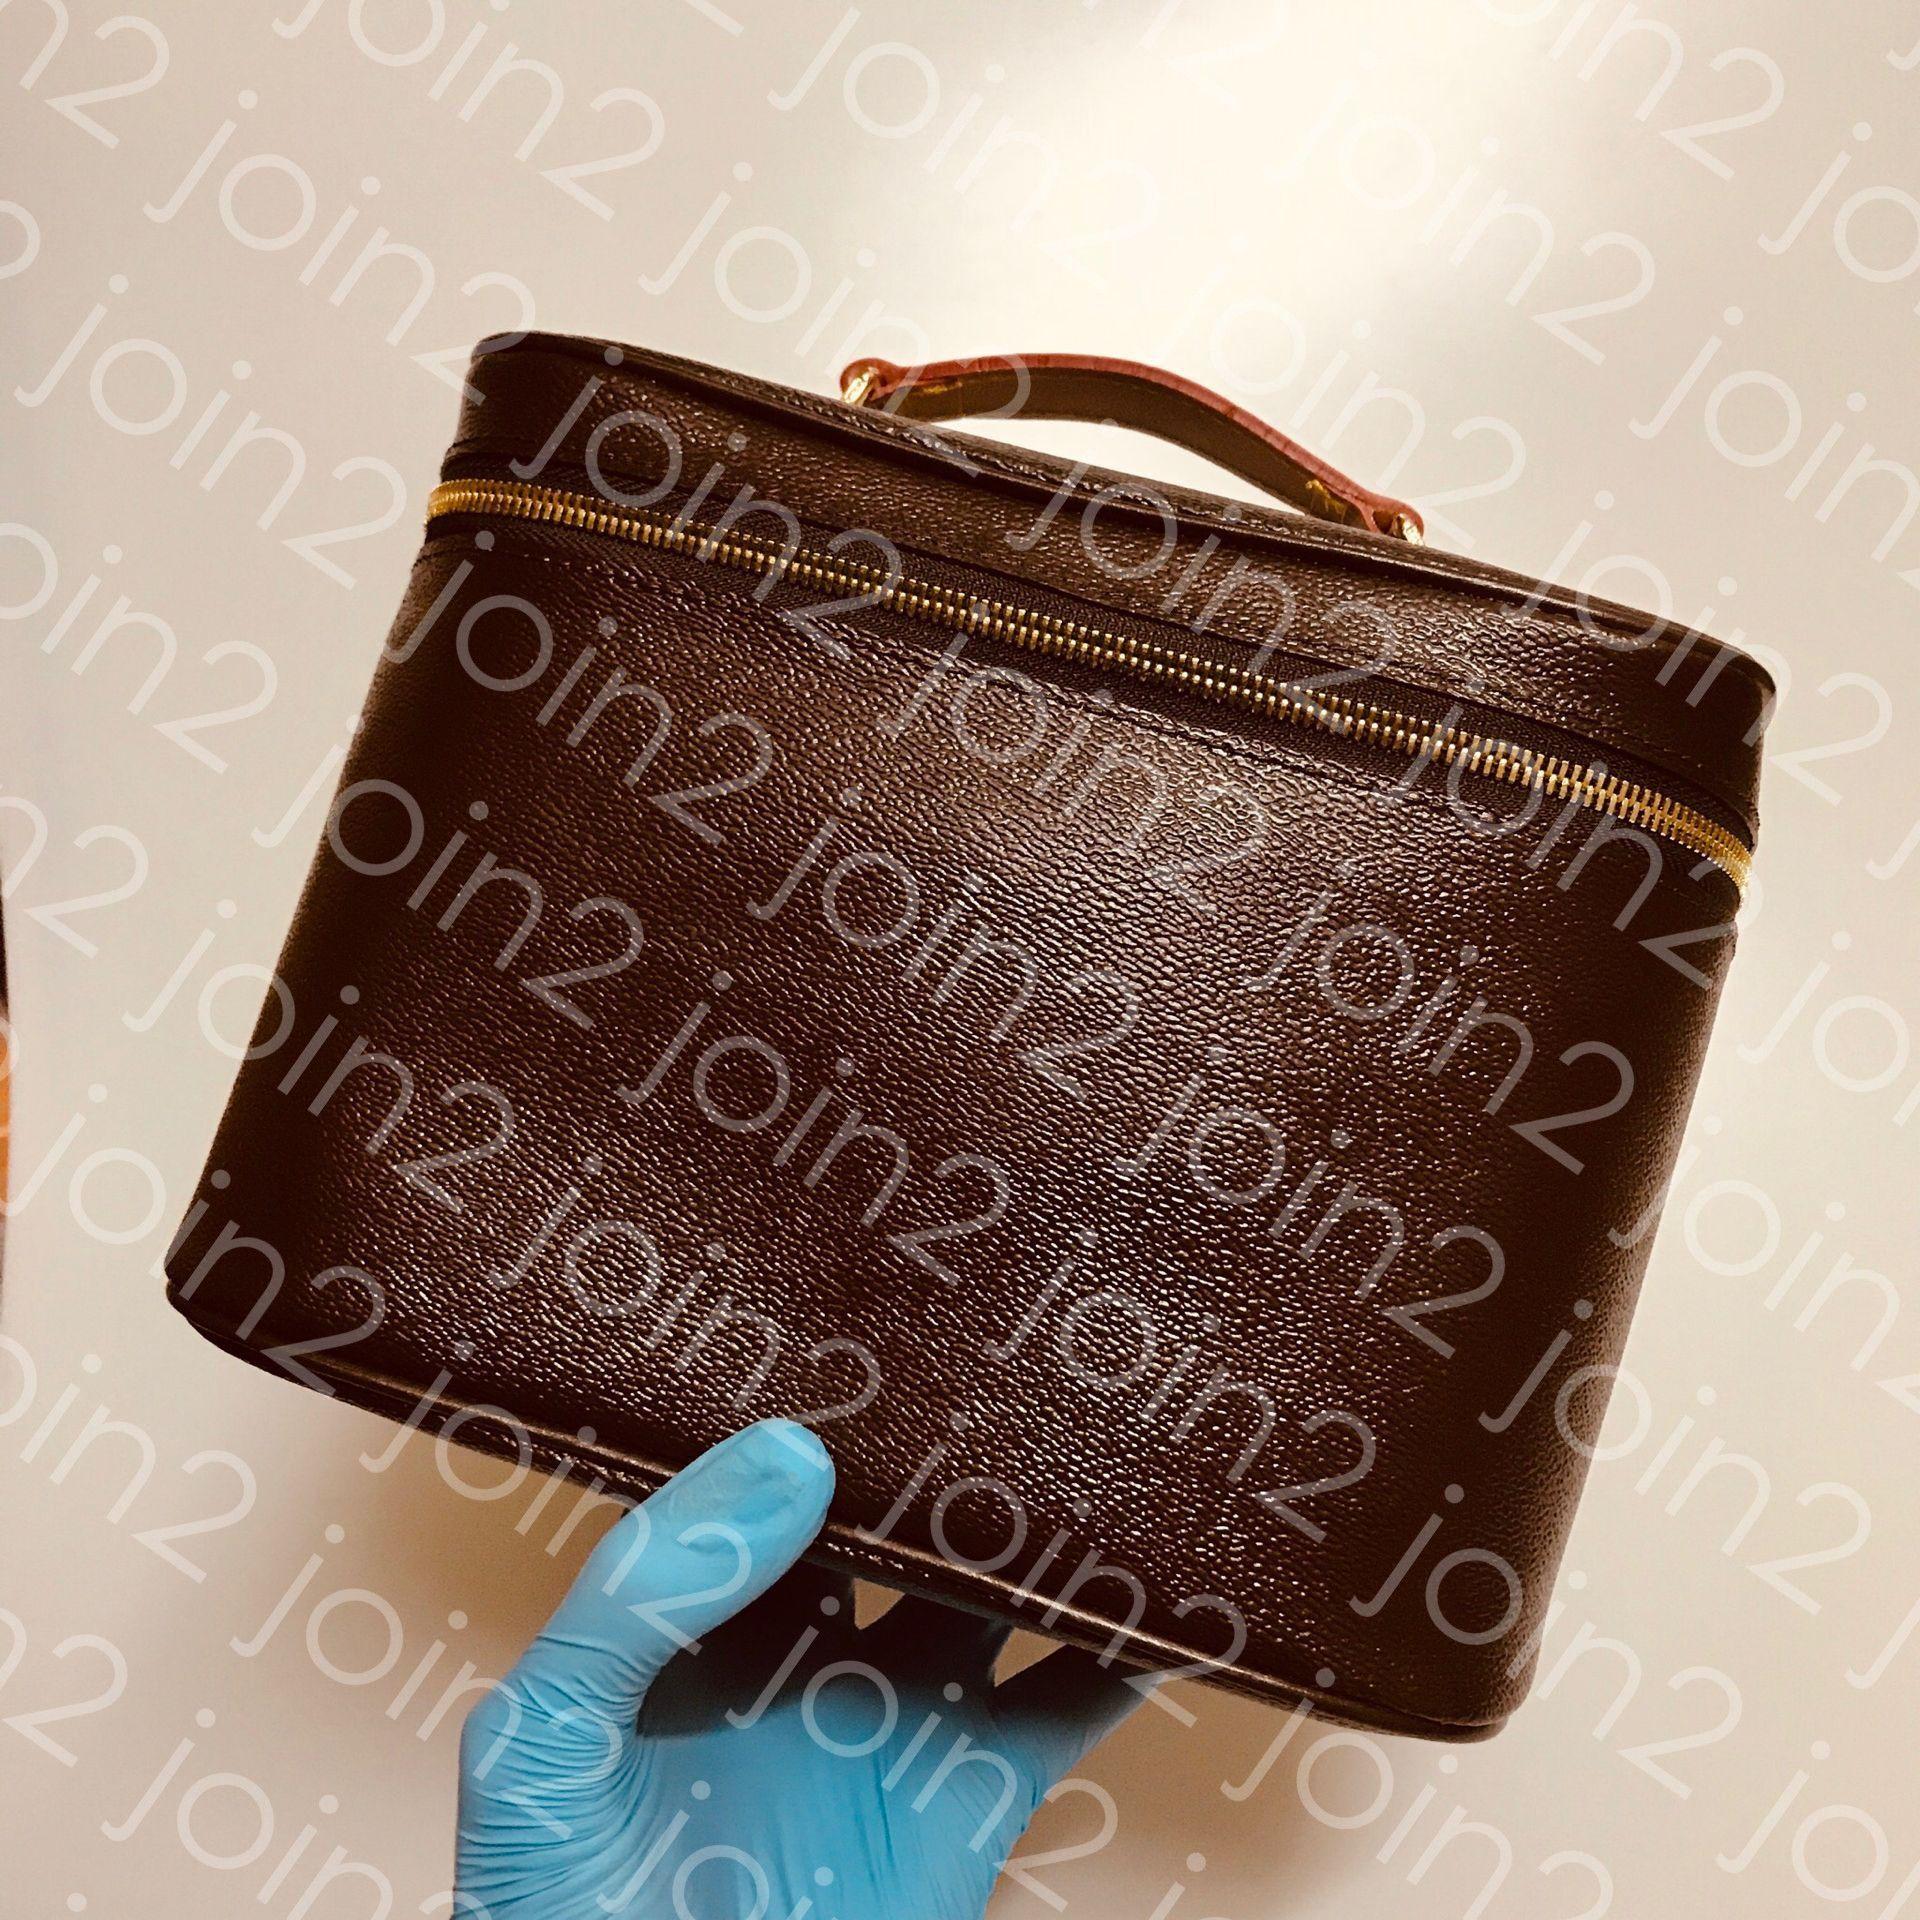 TROUSSE DE TOILETTE NICE BB Top Quality Womens Beauty Case Cosmetic Bag  Makeup Toiletries Bag Brown Waterproof Canvas Washable Lining M42265